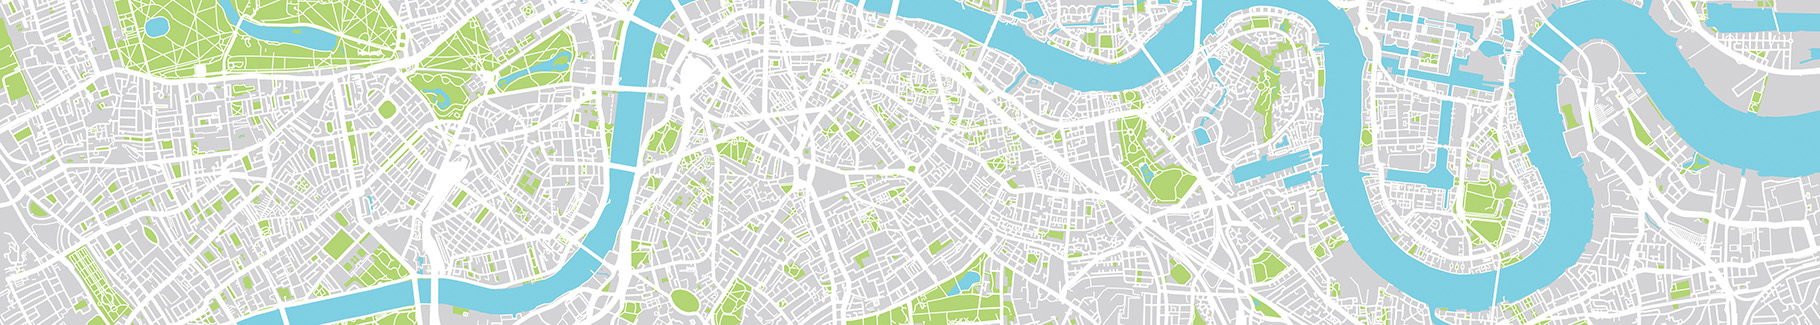 Tapeta rzeka na mapie miasta